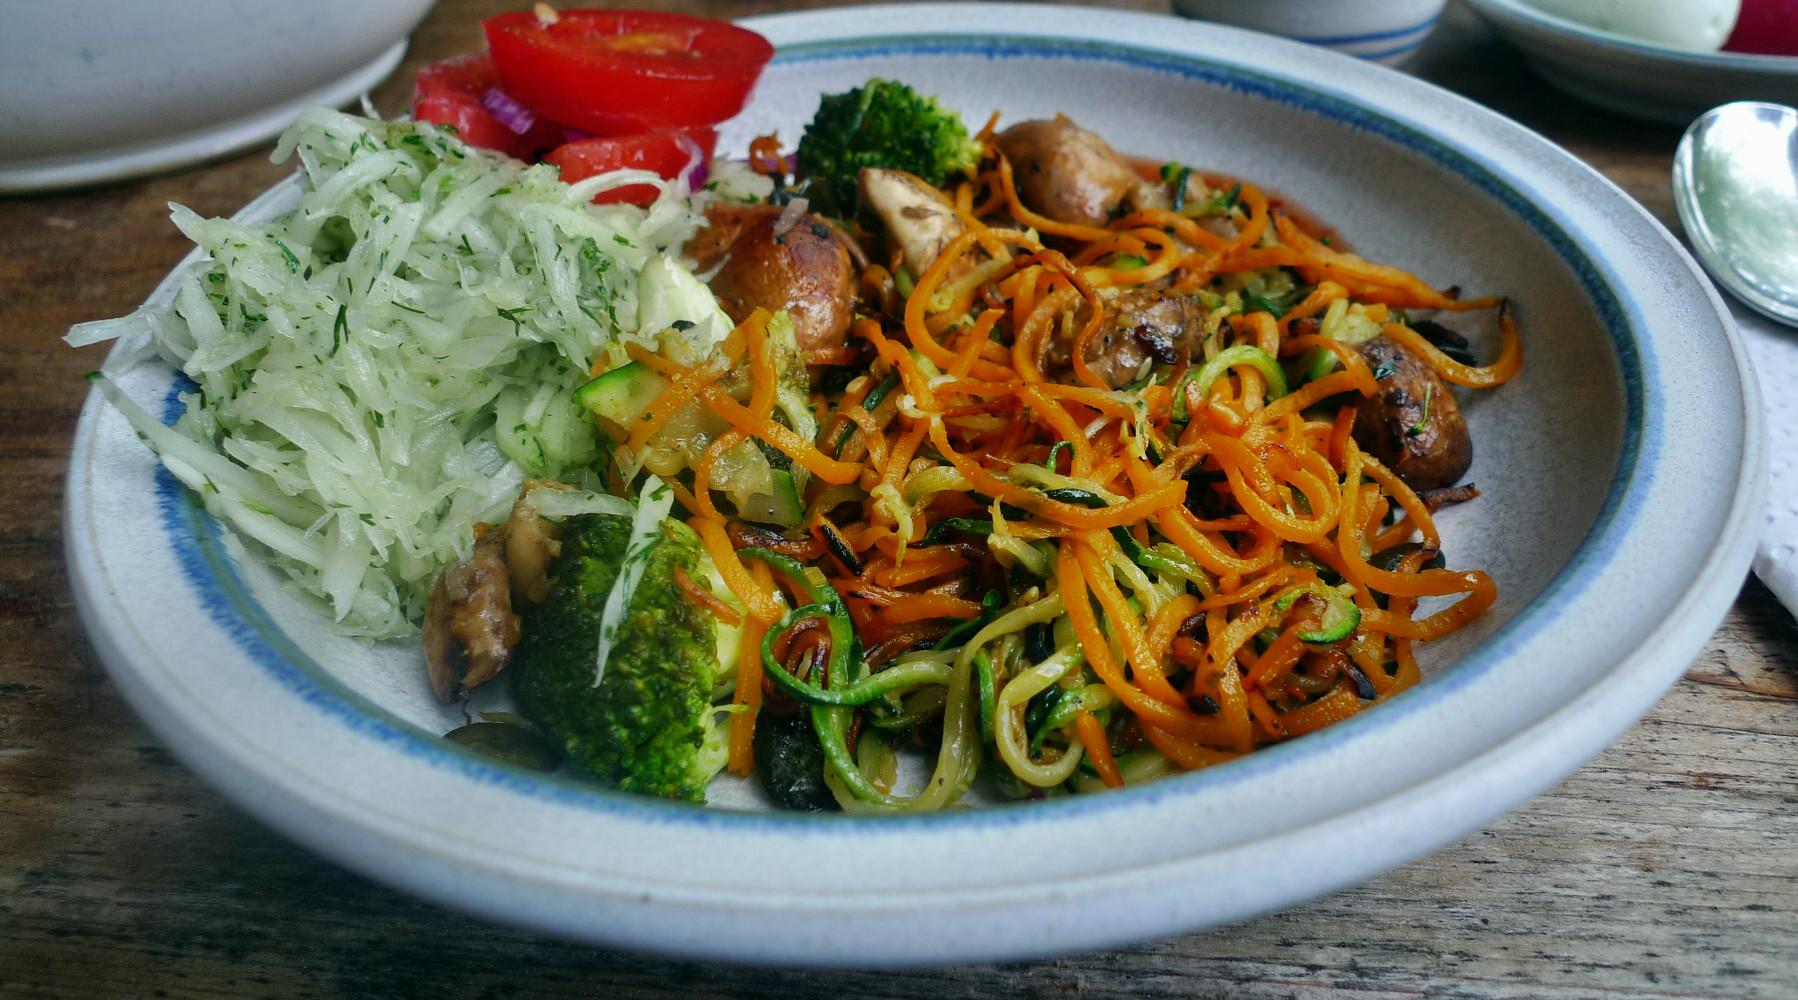 Gemüsespaghetti mit Champignon,Kohlrabisalat,Tomatensalat,vegan -5.5.15   (16)